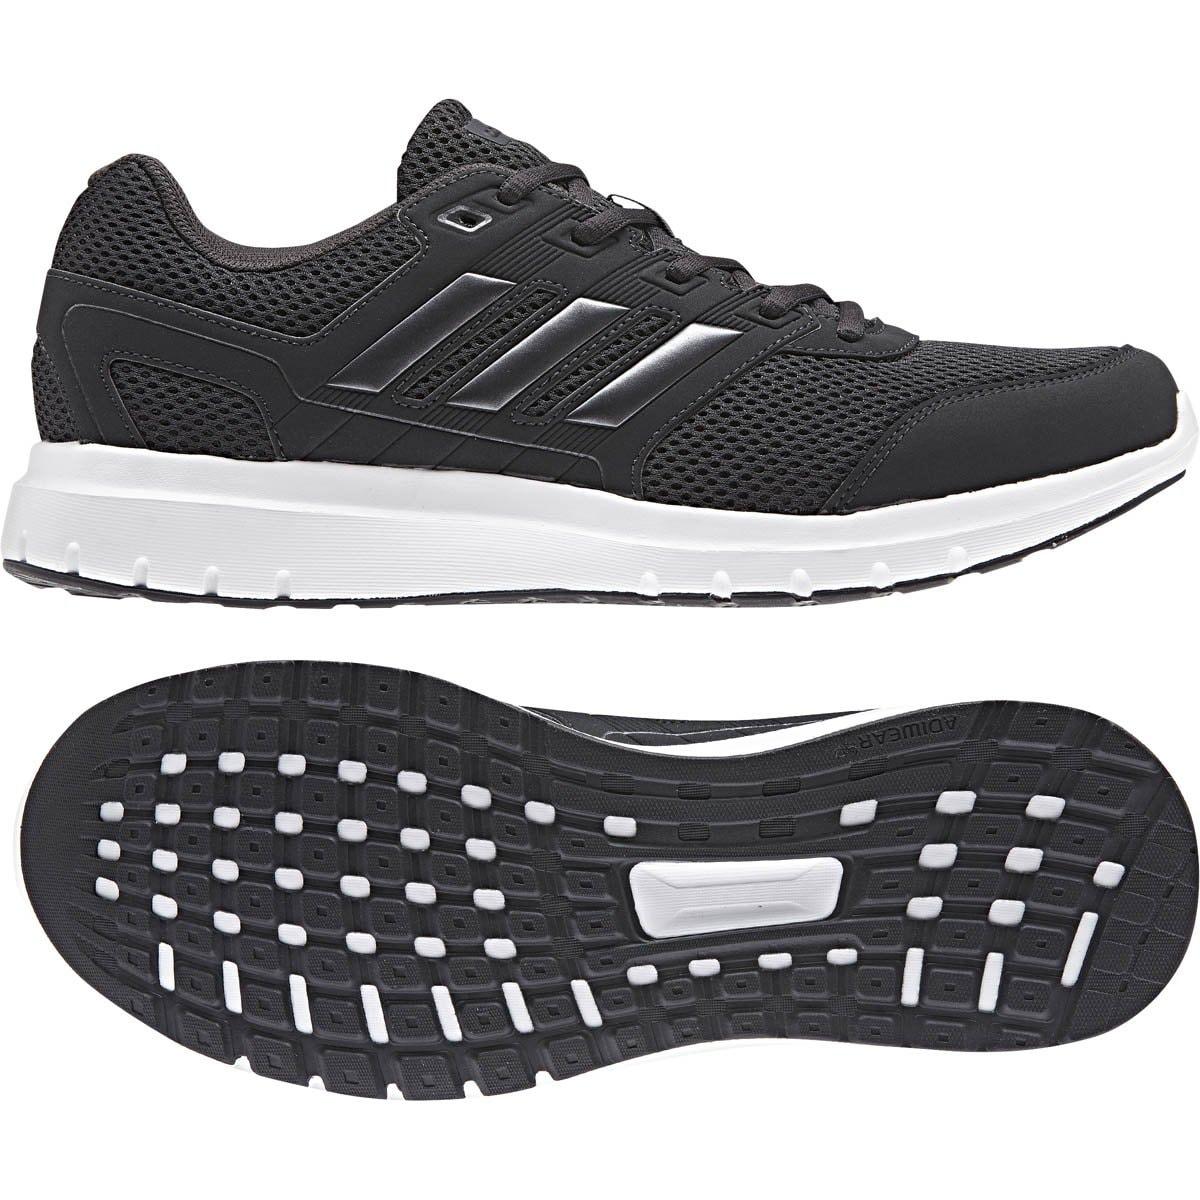 Tenis Running Duramo Lite 2.0 Adidas - Caballero